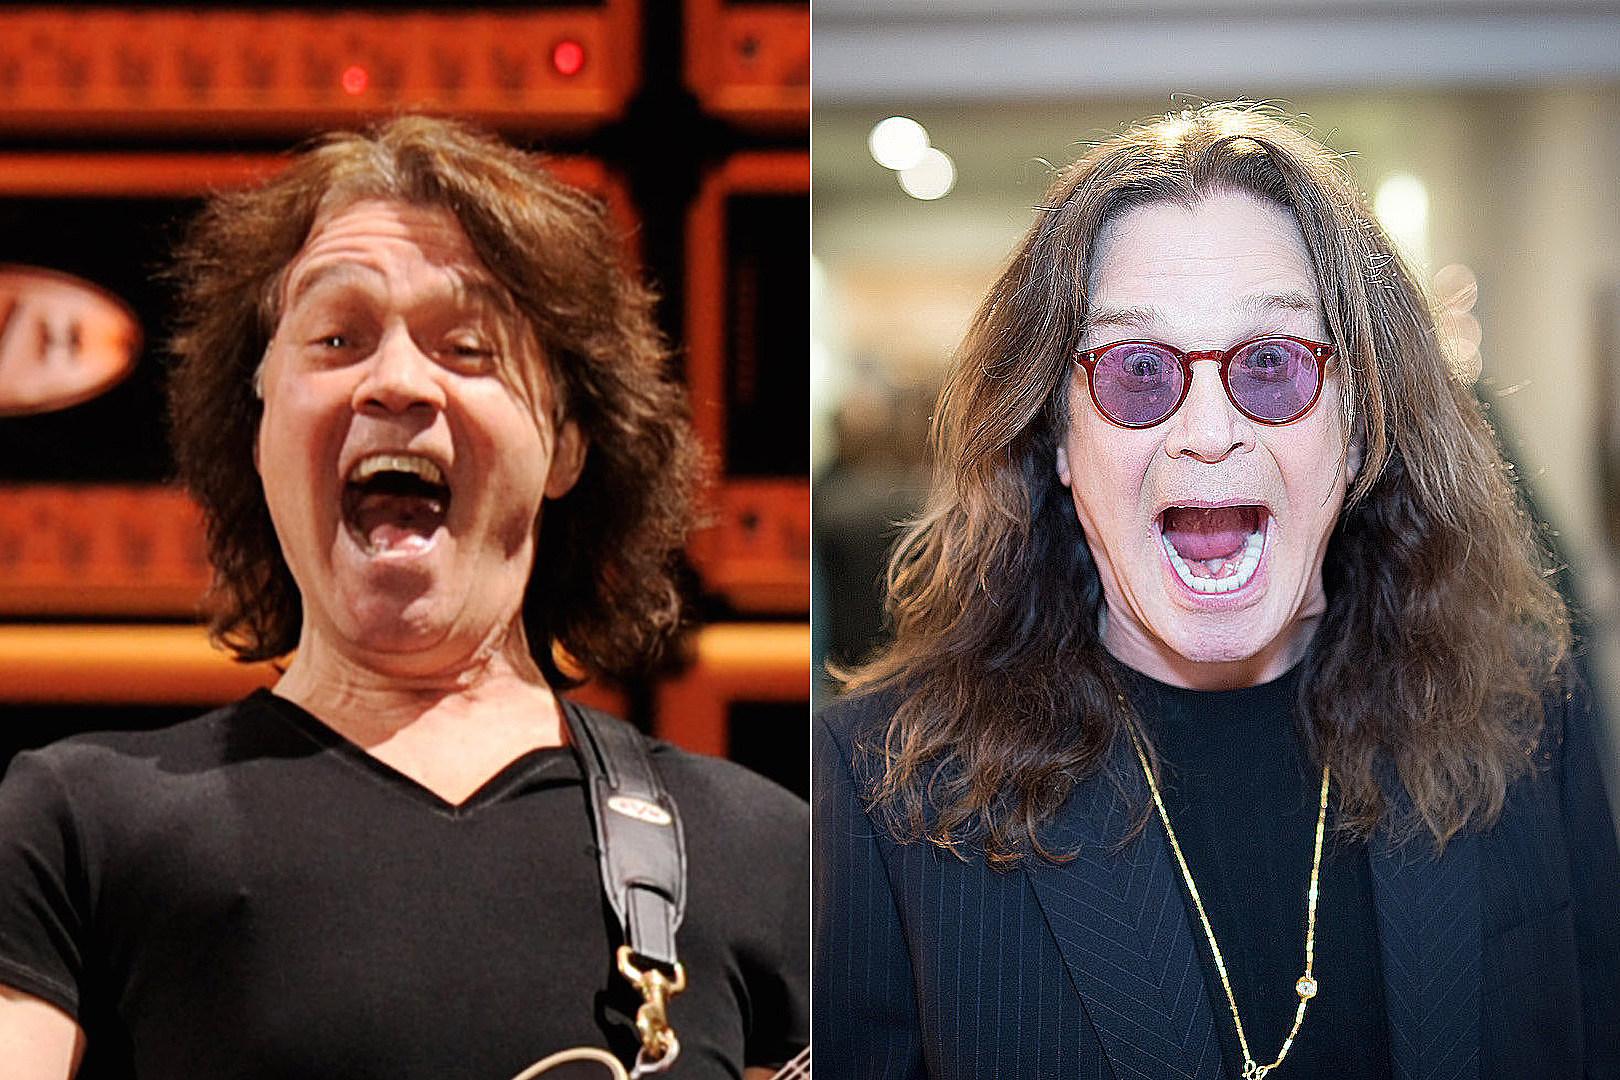 EVH Once Drunk Dialed Ozzy + Asked Him to Sing for Van Halen